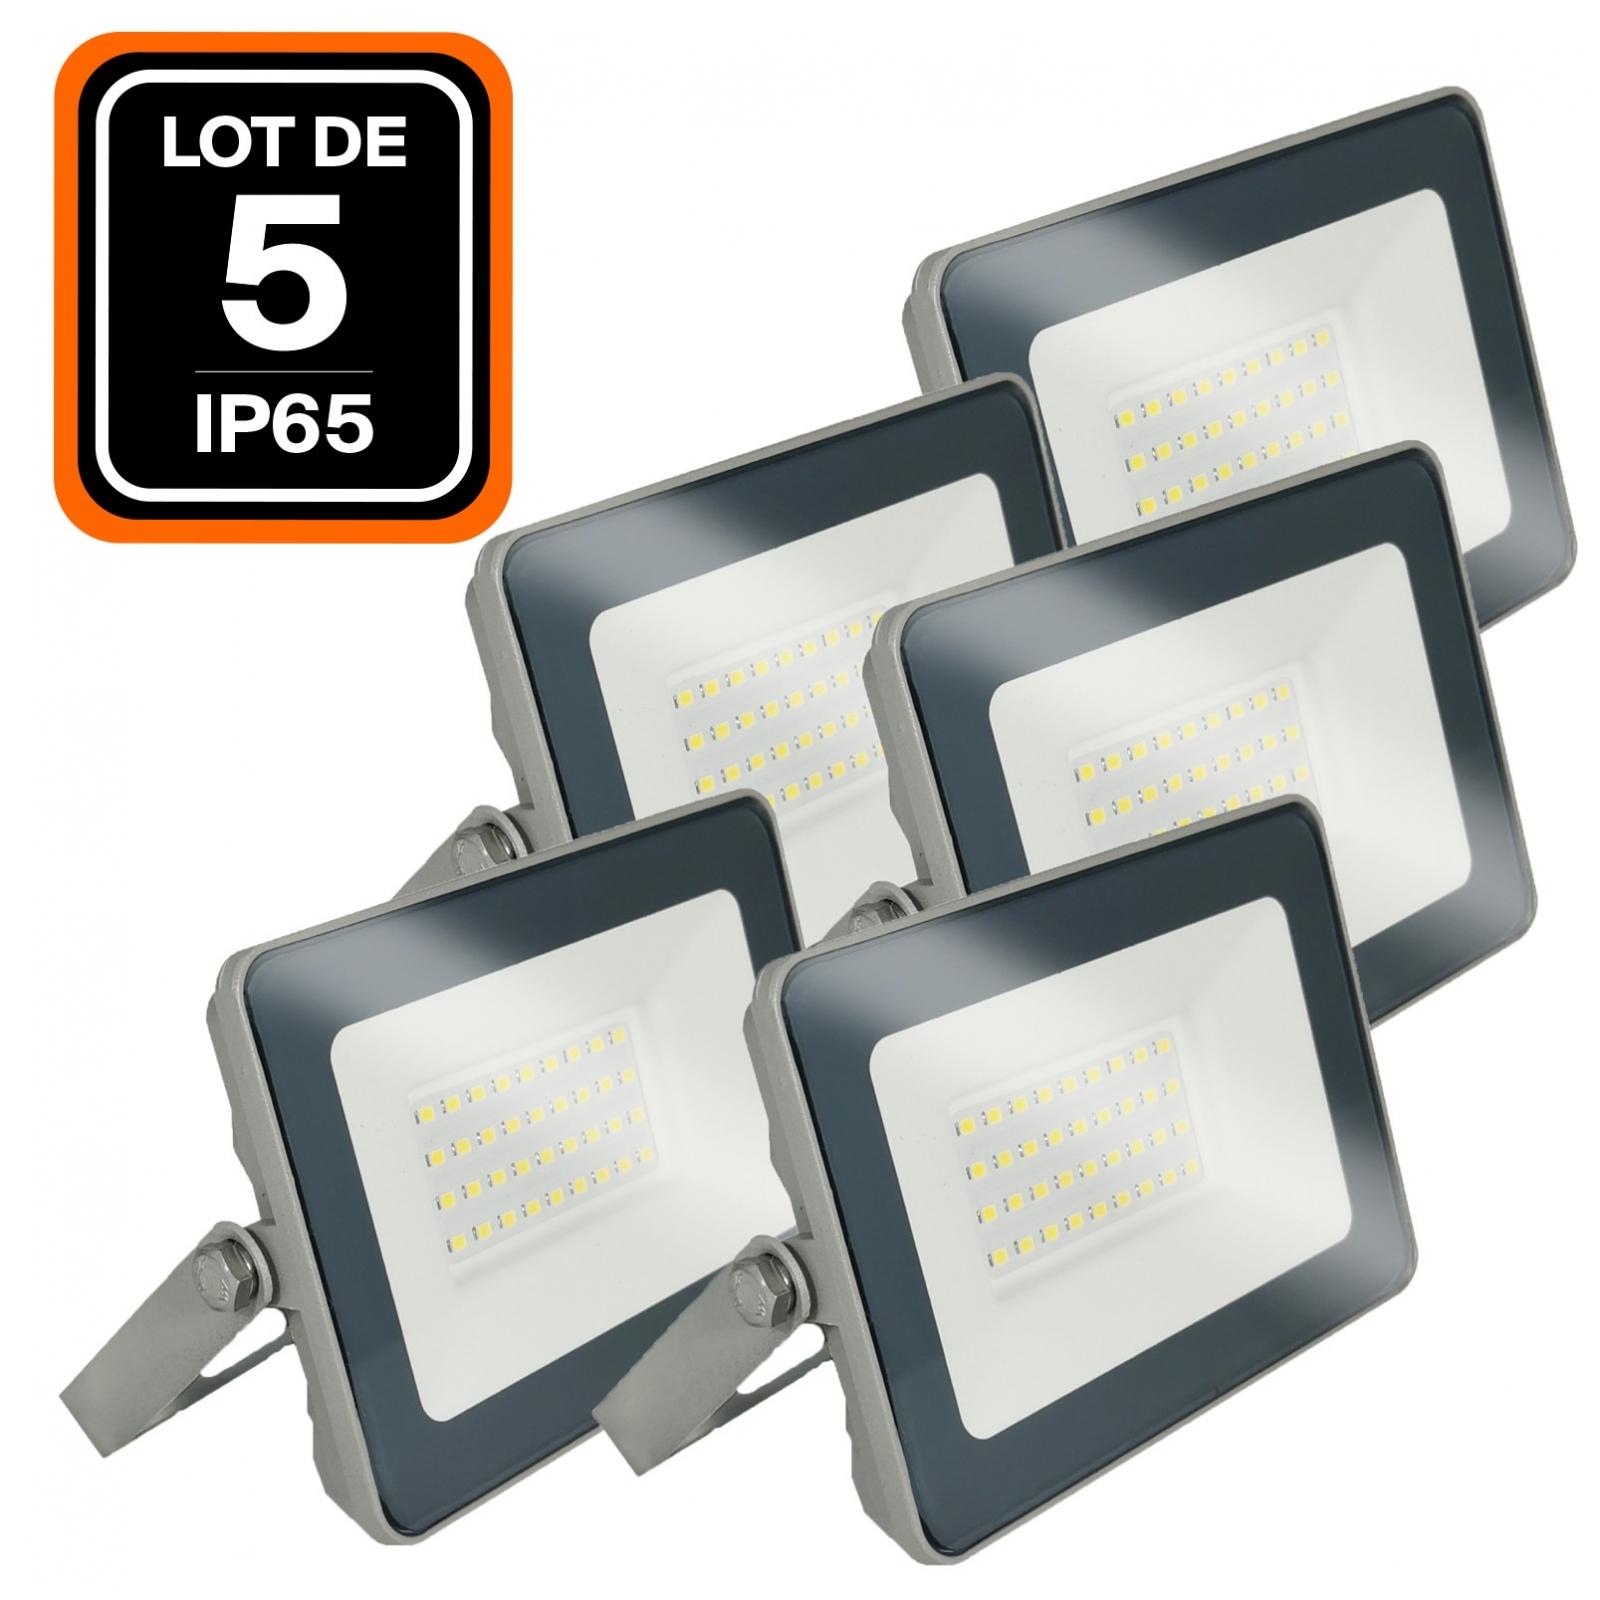 2 Projecteurs LED 20W Ipad Blanc chaud 2700K Haute Luminosité